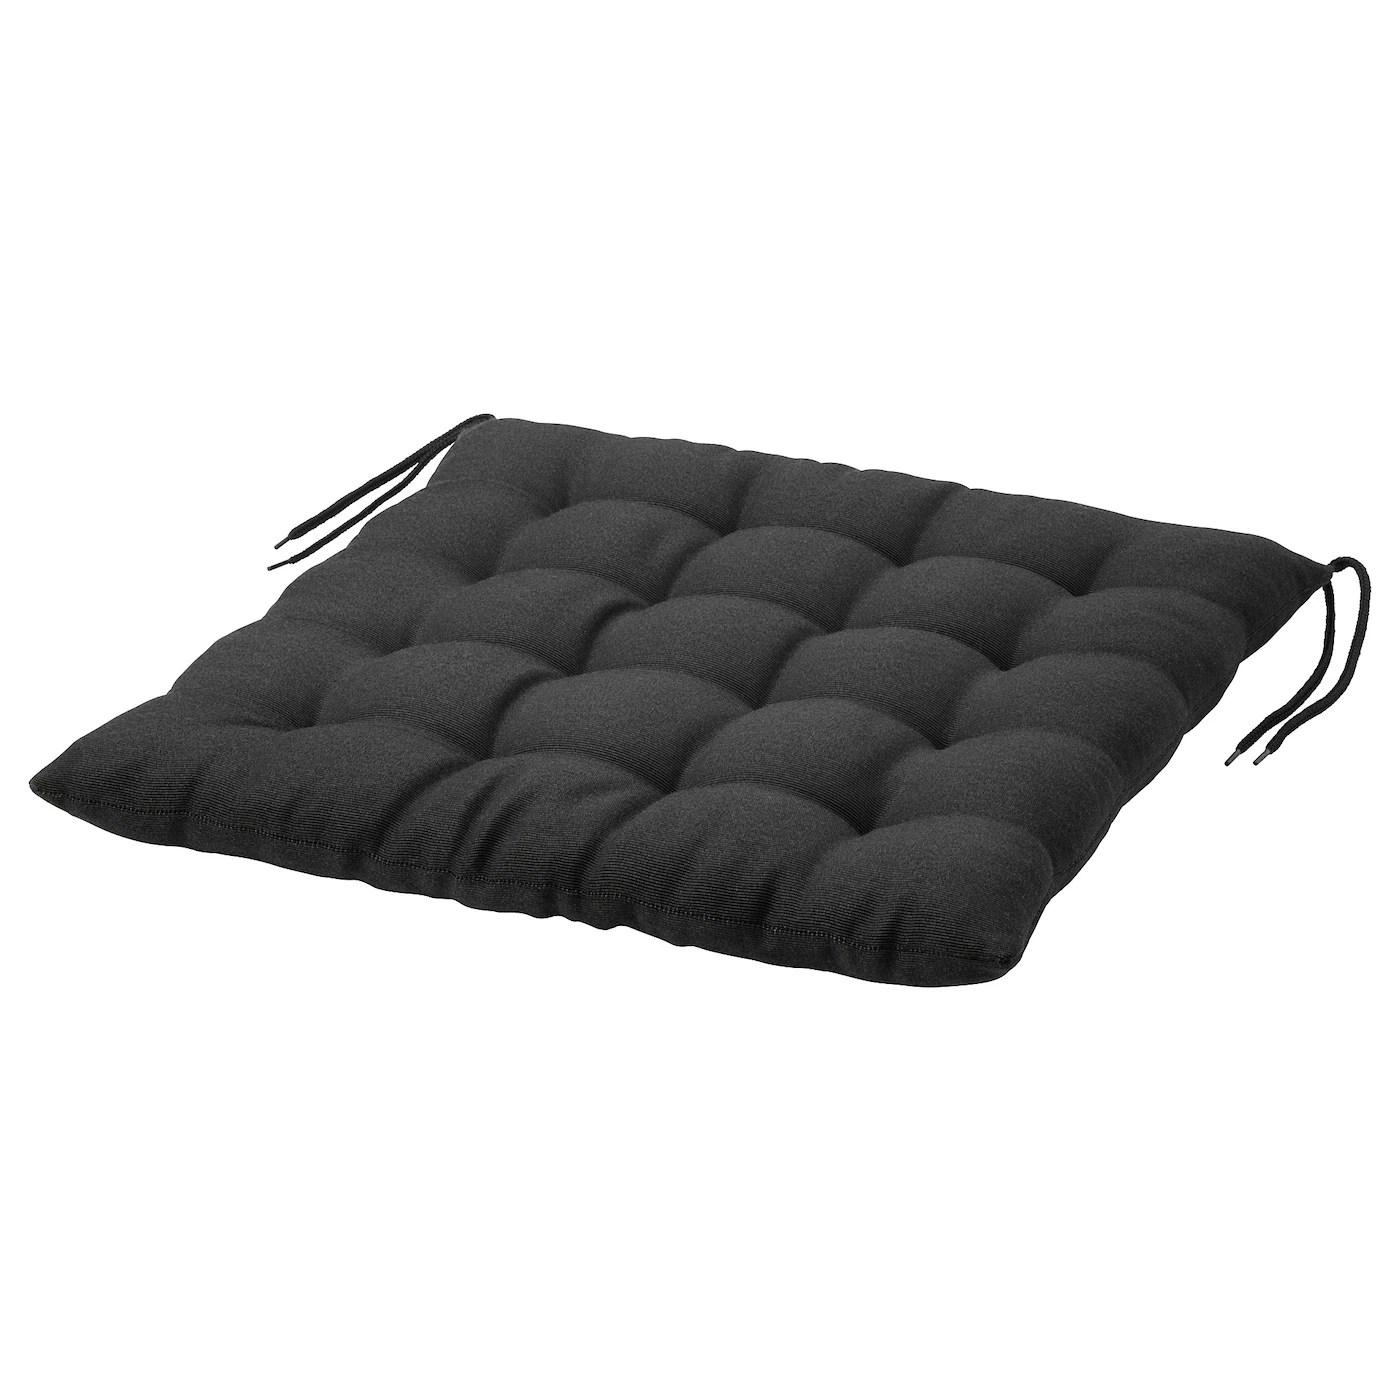 chair cushions with ties ikea black sequin covers hÅllÖ cushion outdoor 50 x cm